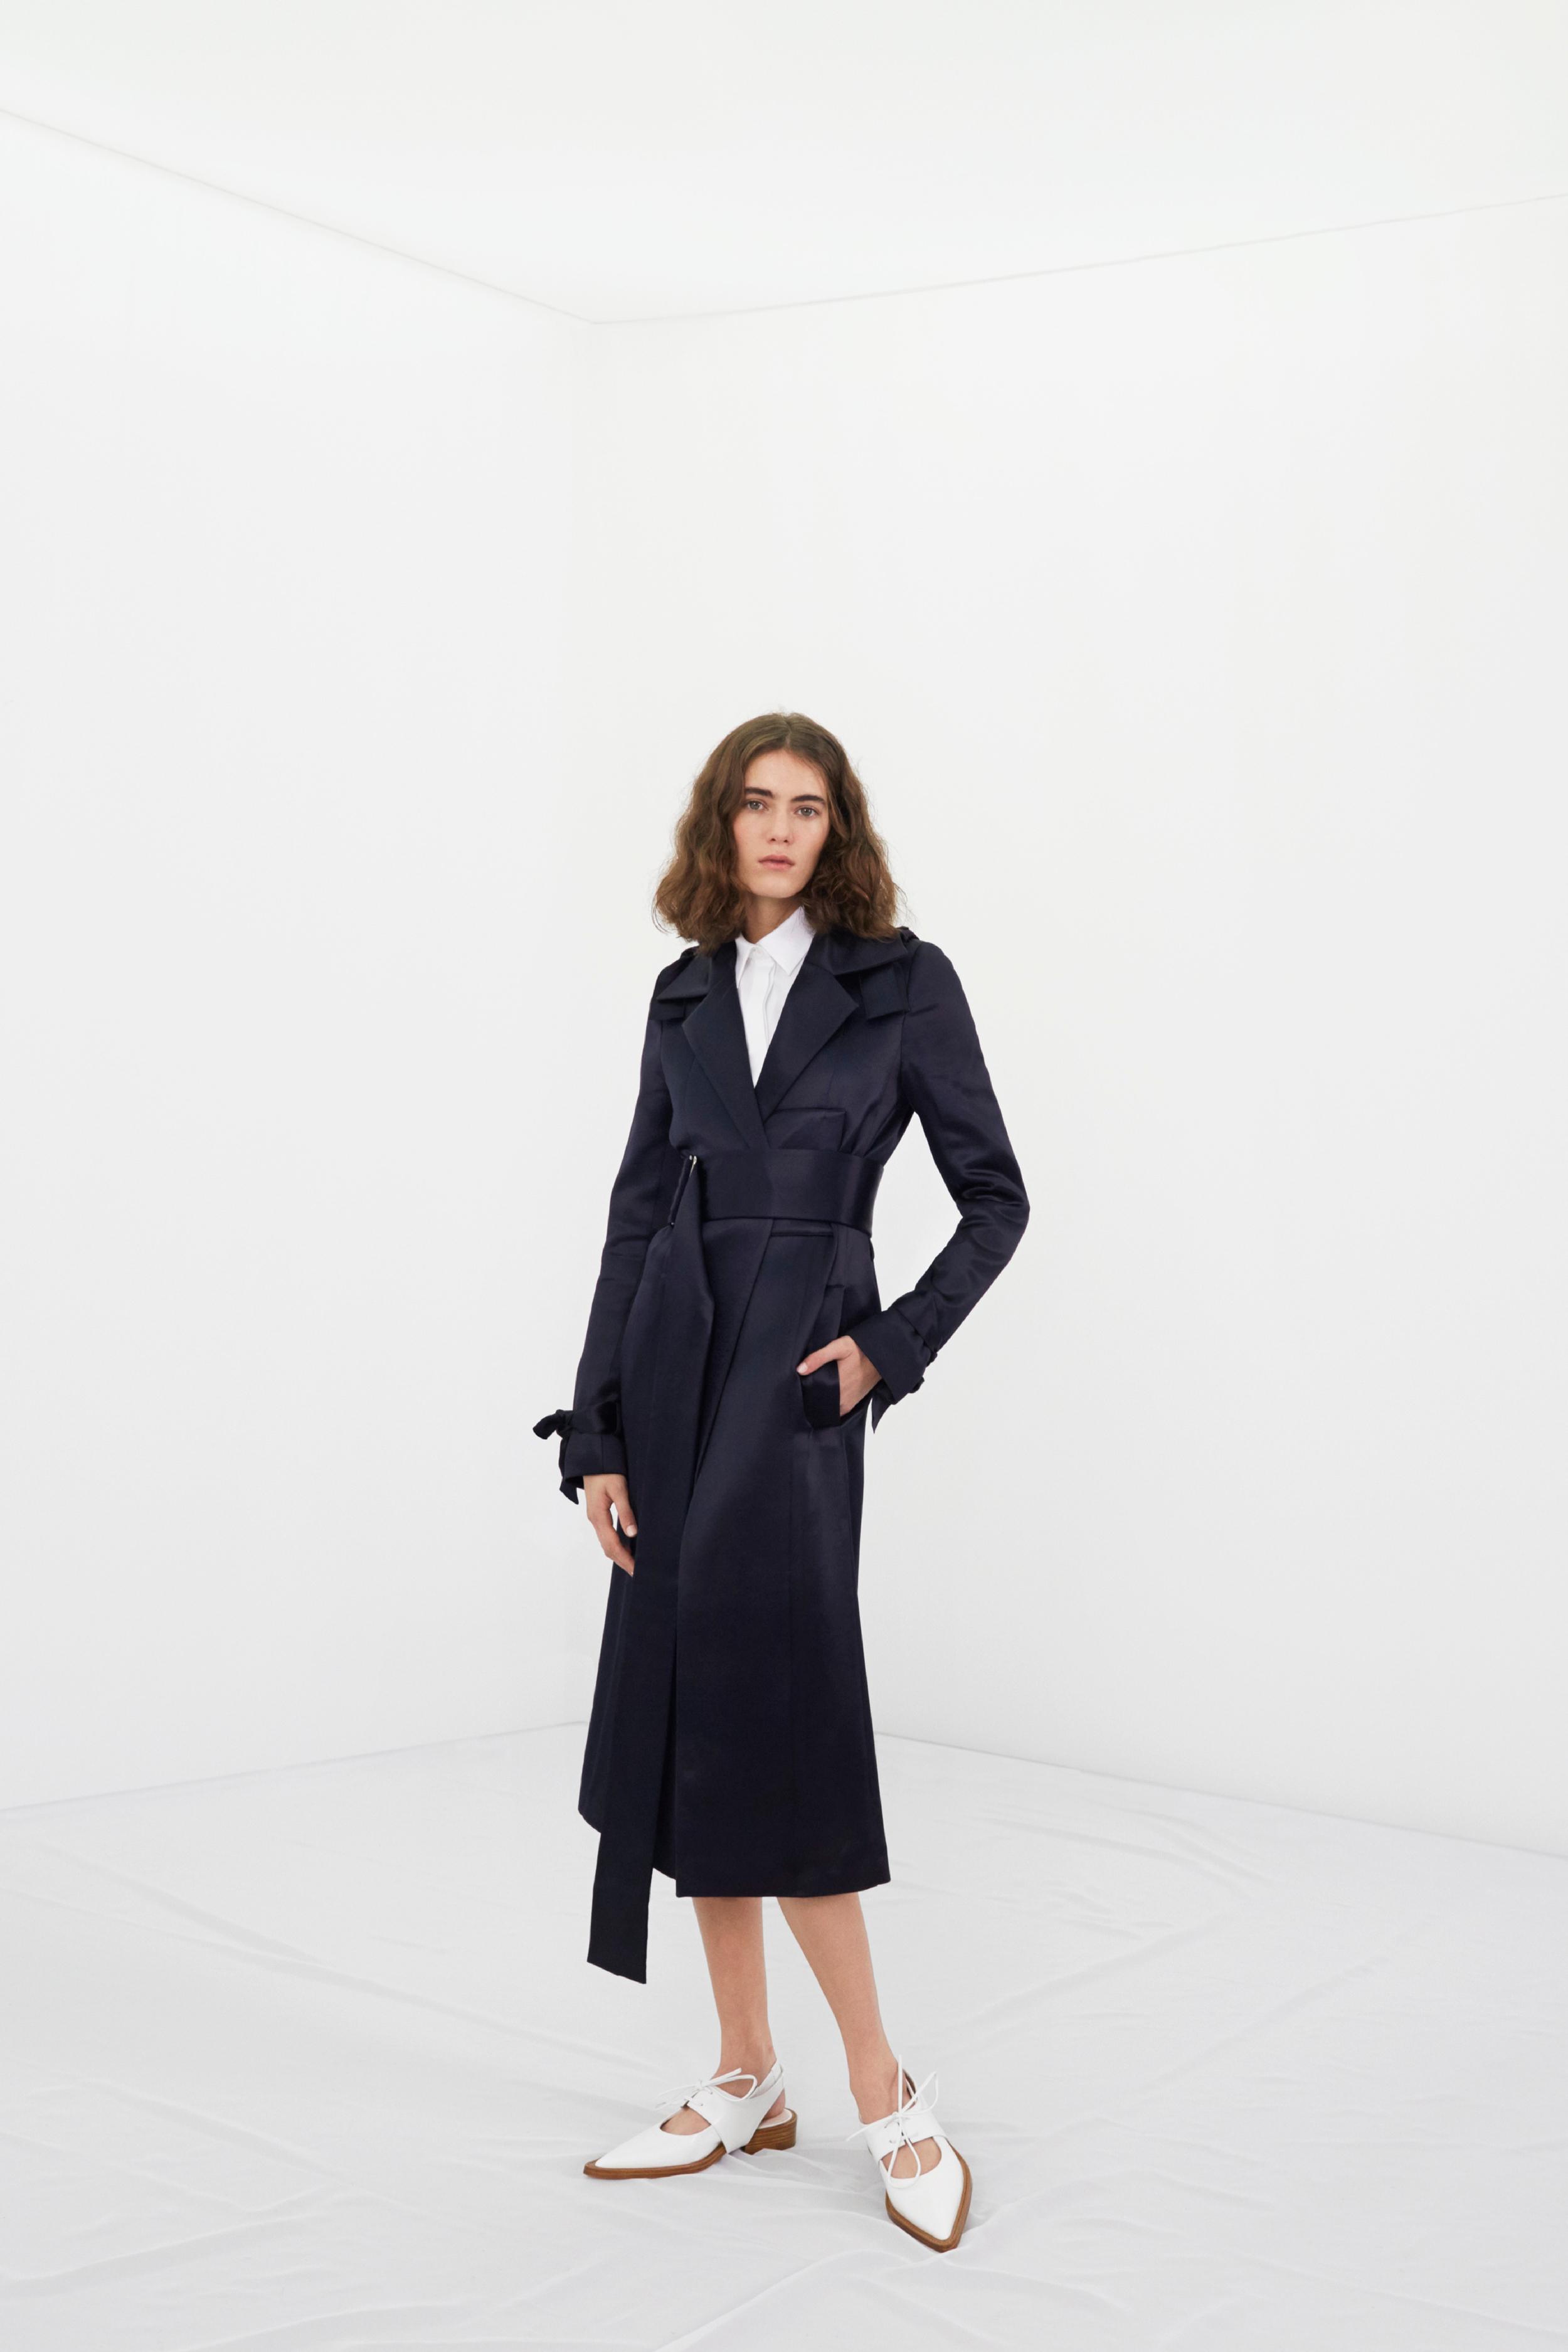 Design fashion drawings dresses